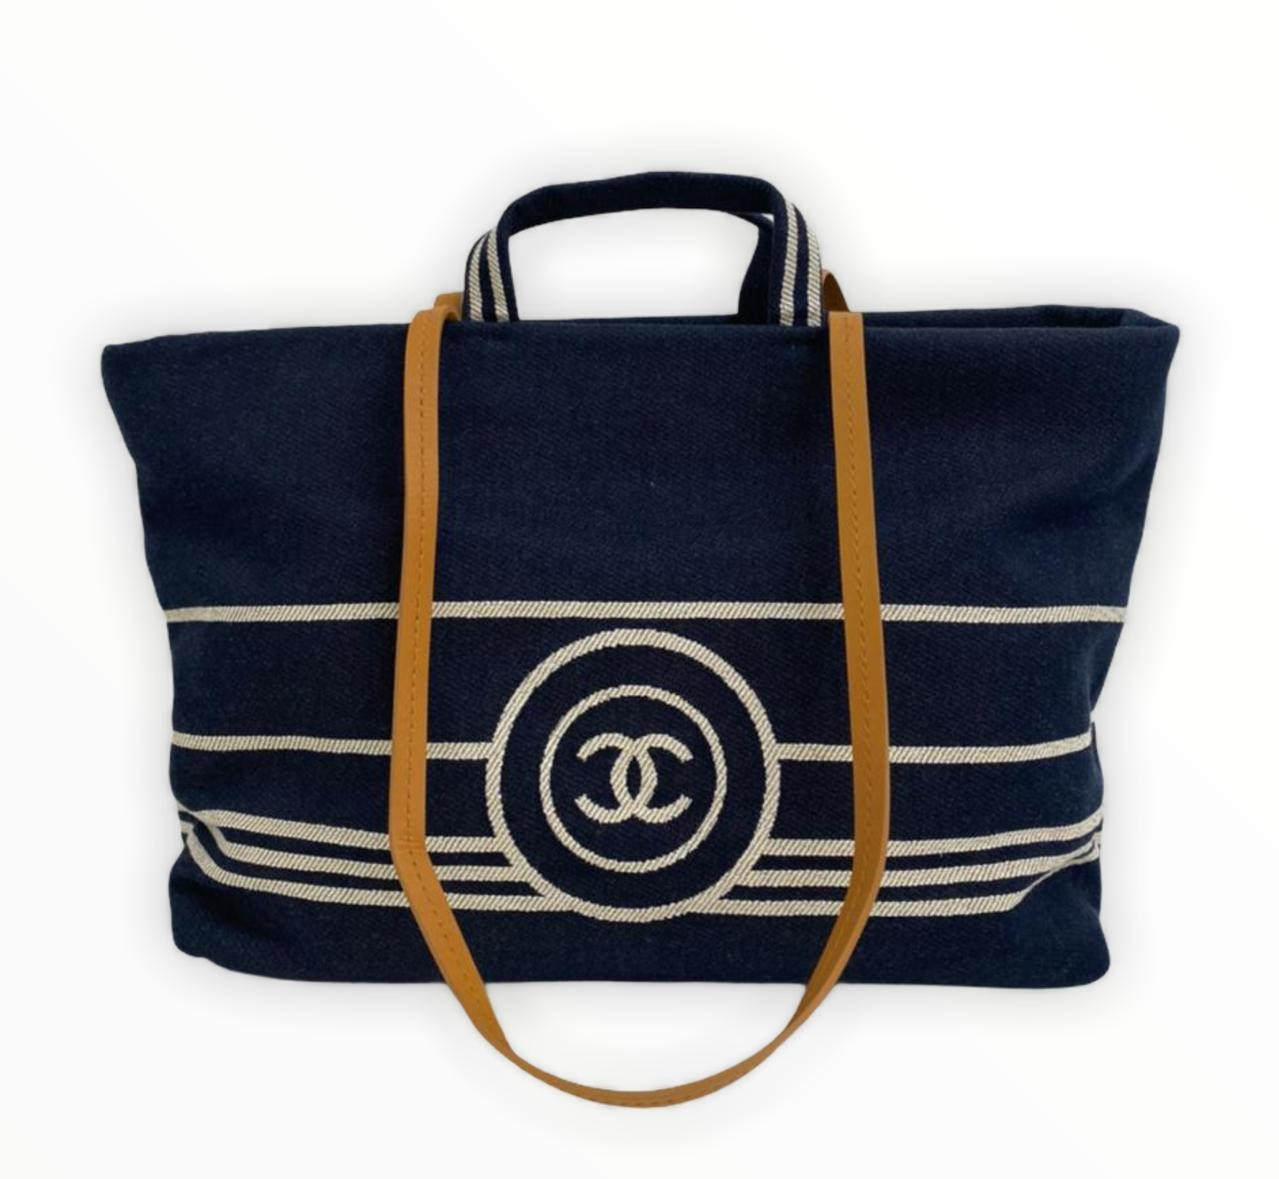 Bolsa Chanel CC Shopping Large Denim